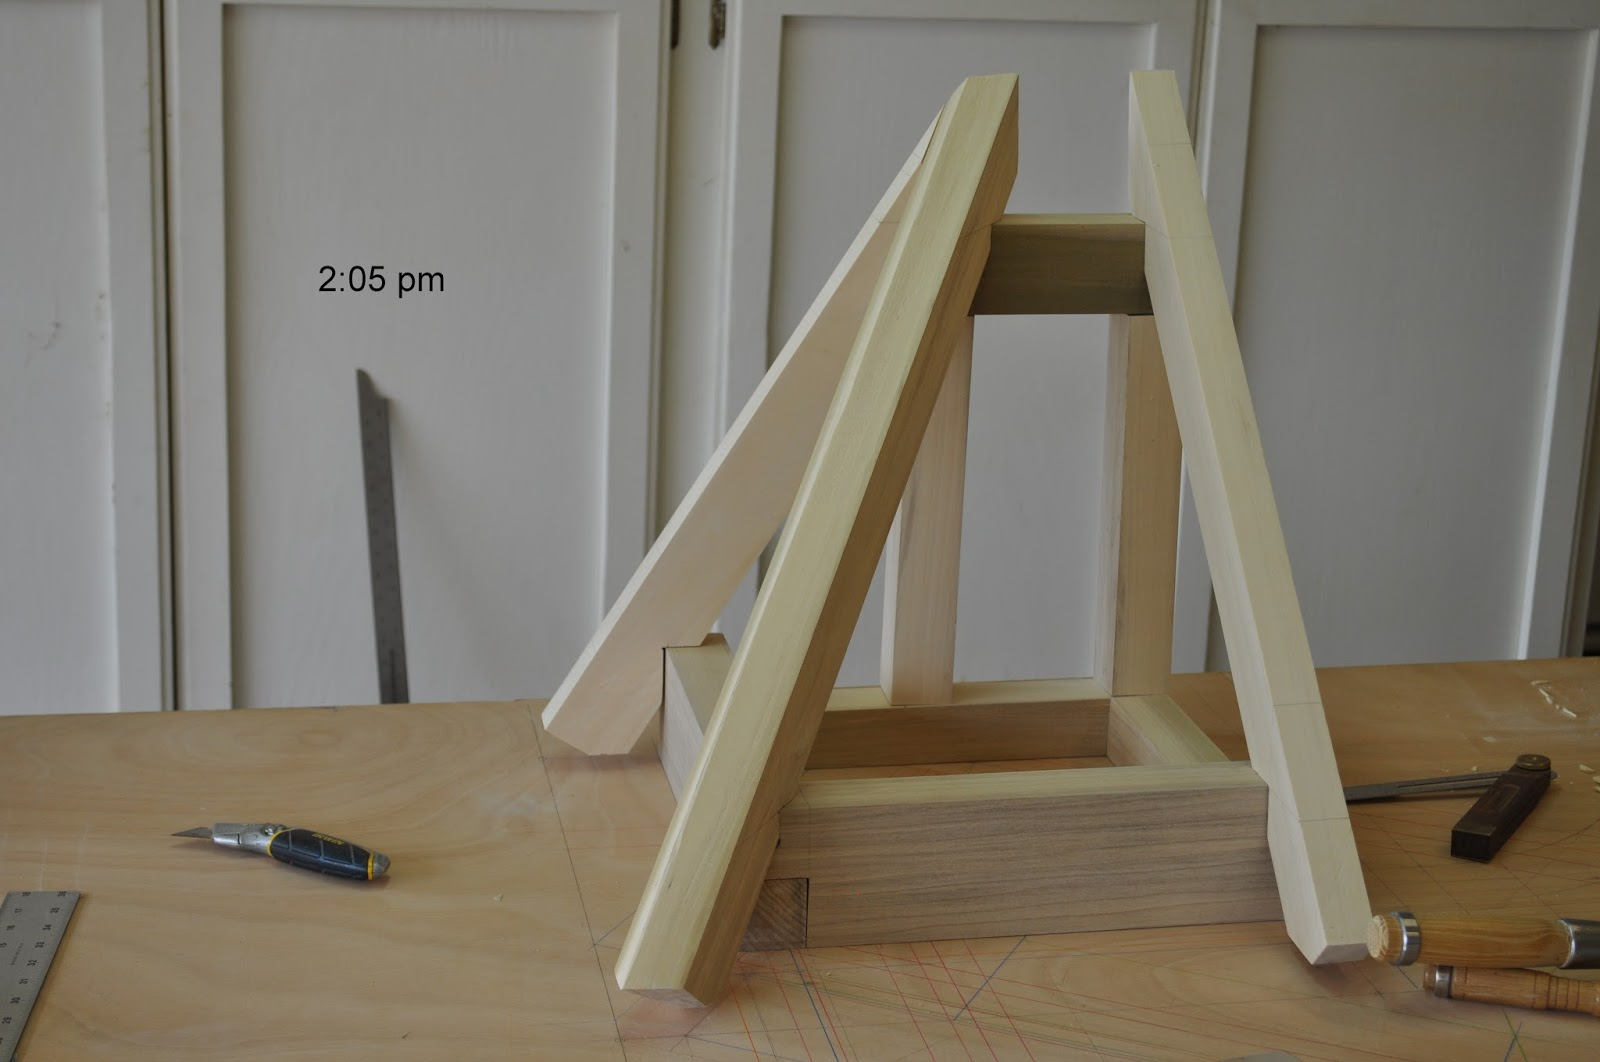 Roof Framing Geometry American Journeyman Carpenters